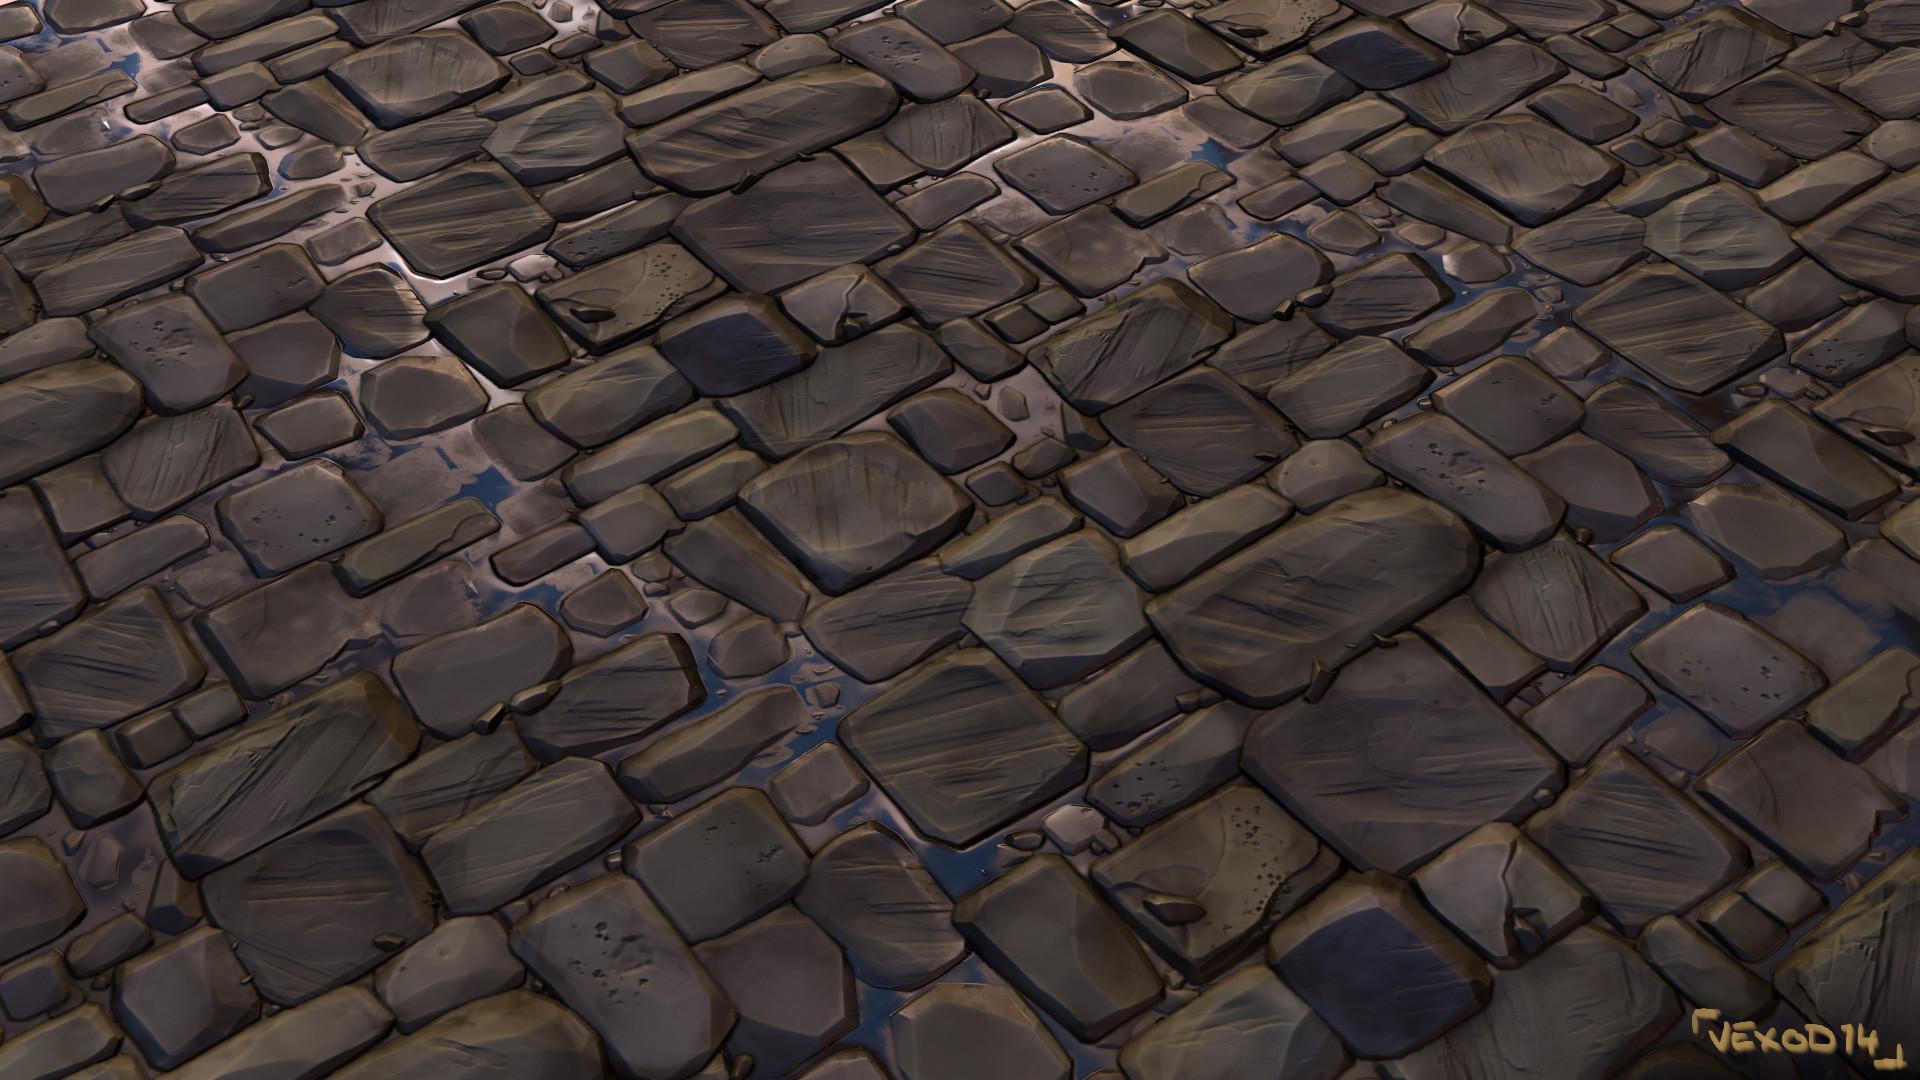 etienne-beschet-texturing-tile-pavements